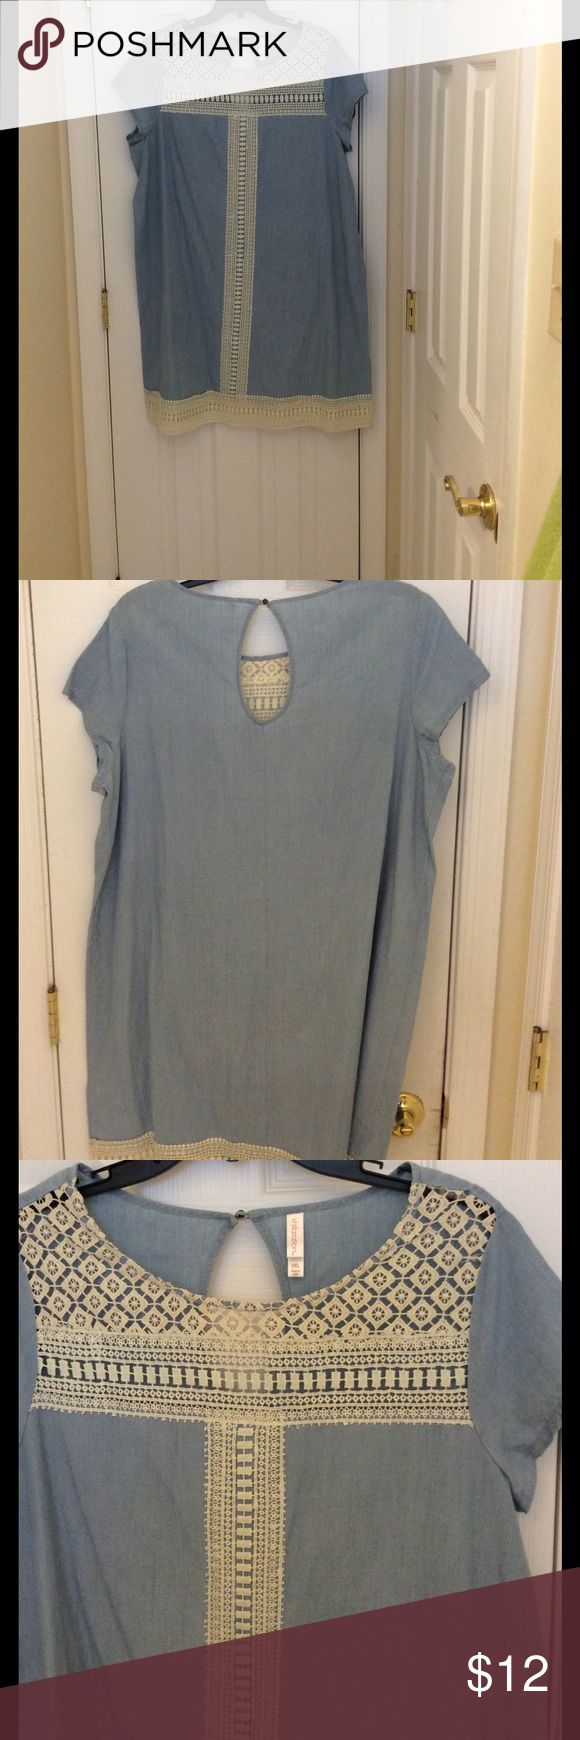 Xhilaration light denim shirt dress Light blue denim shirt dress with ivory lace. New without tags. Never worn. The size is a XXL (12/14) Xhilaration Dresses Midi